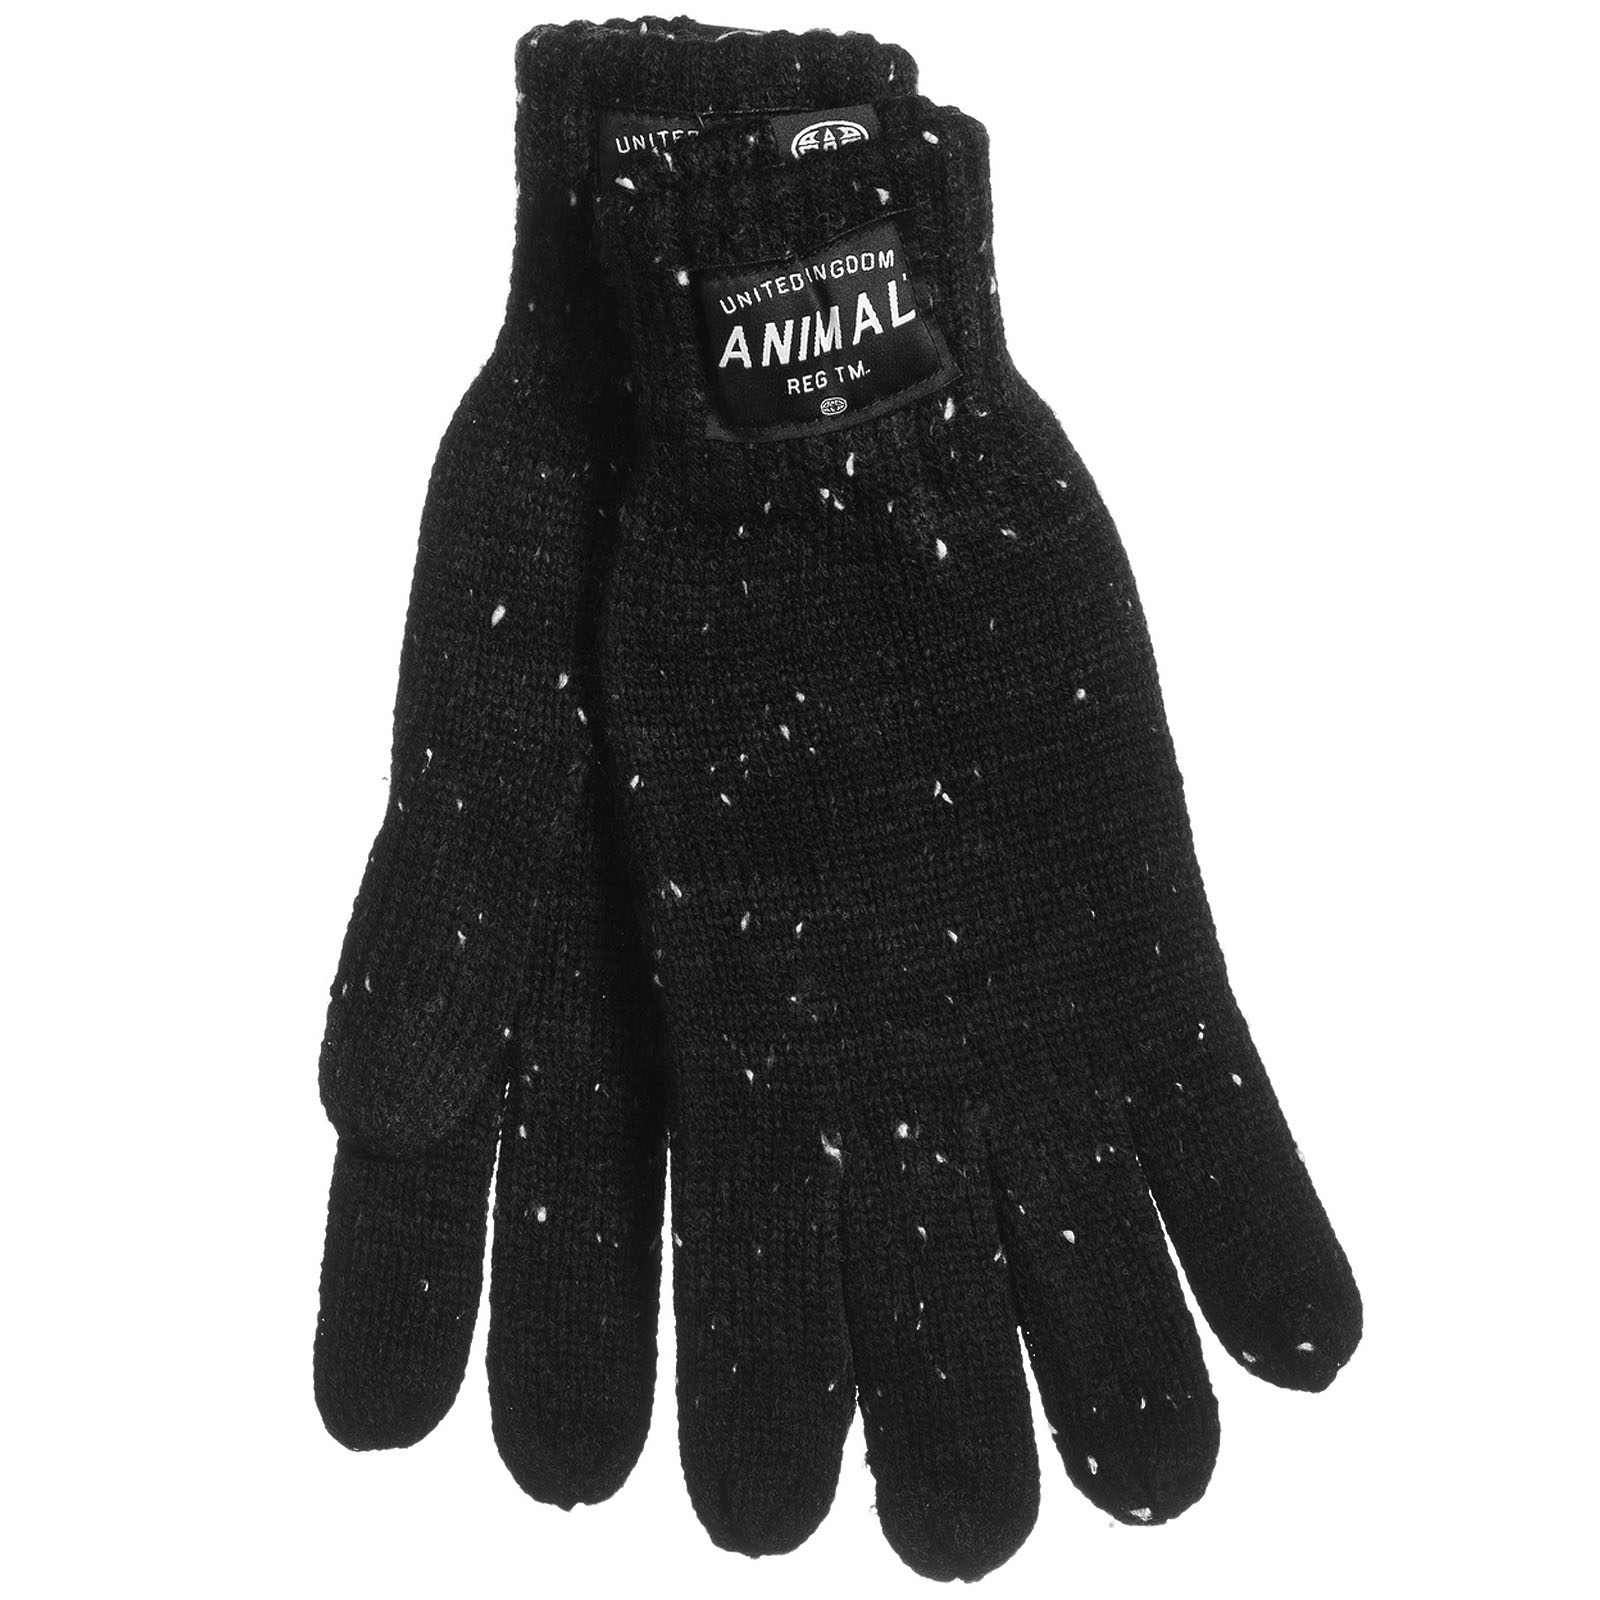 Animal Mens Falcann Allex Winter Knitted Hat And Gloves Set - Black ... c2bfa170d654